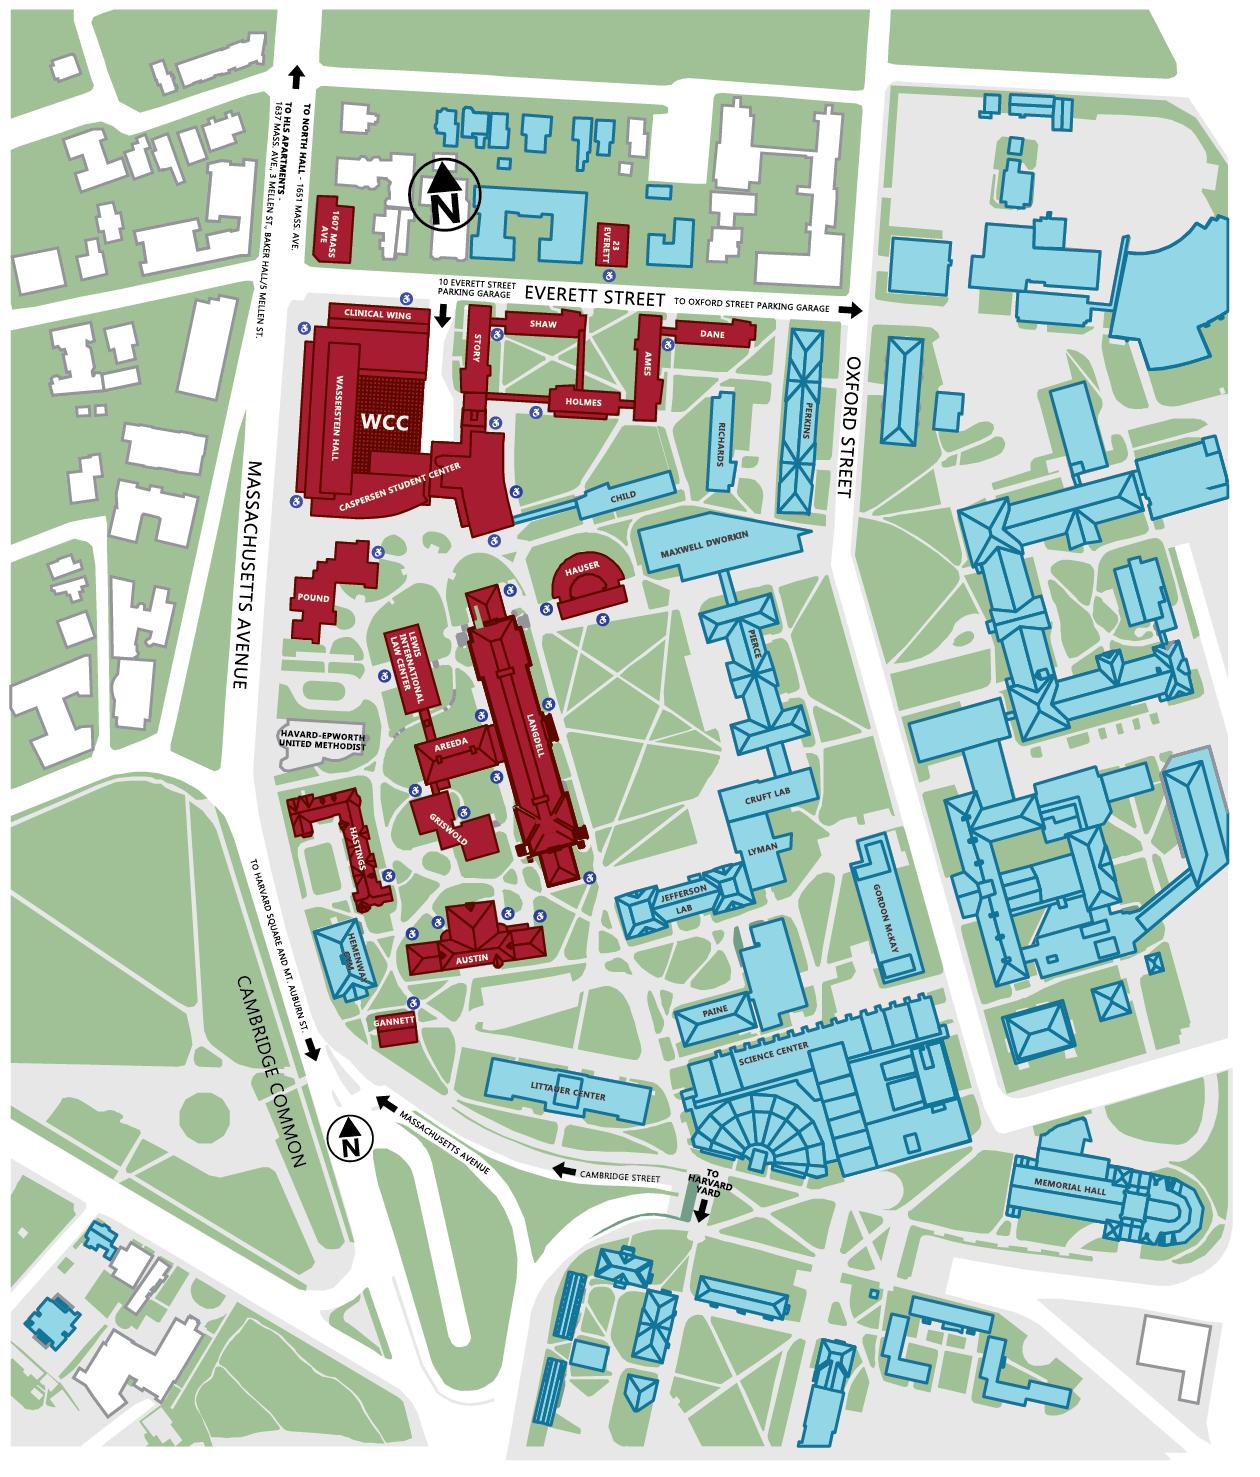 Harvard University Campus Map Harvard campus map from hls 1